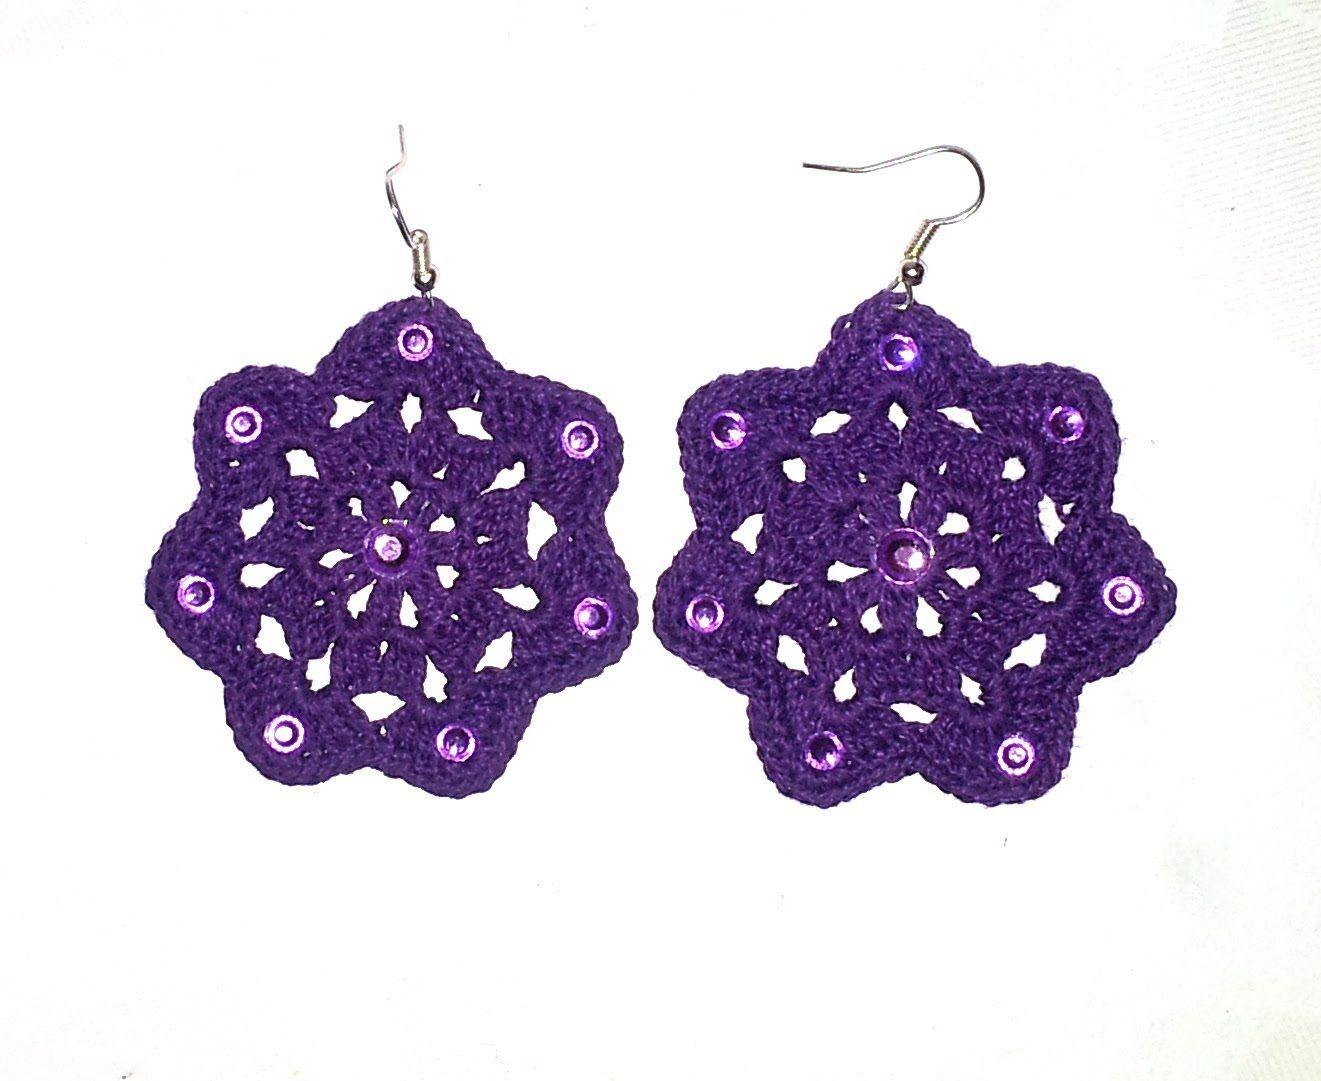 Diy Tutorial Orecchini Uncinetto Medea How To Crochet Earrings Eng